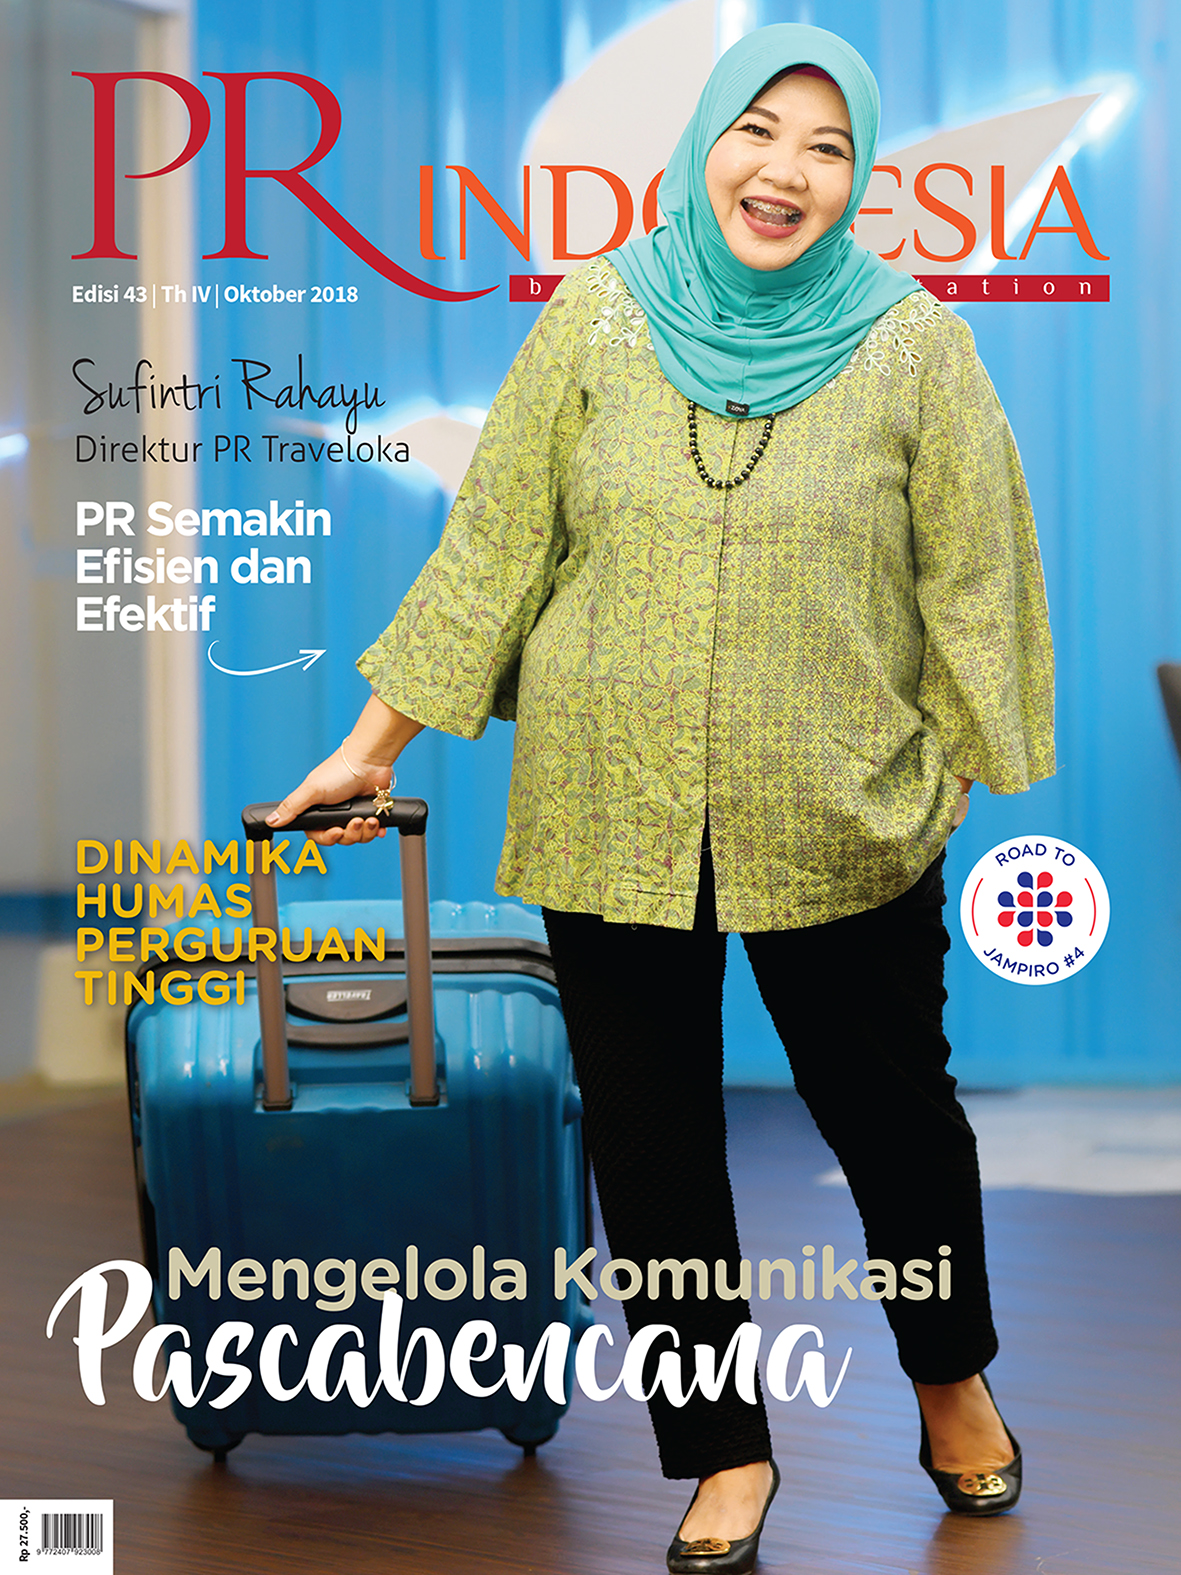 PR INDONESIA-Cover-Edisi 43-Oktober 2018